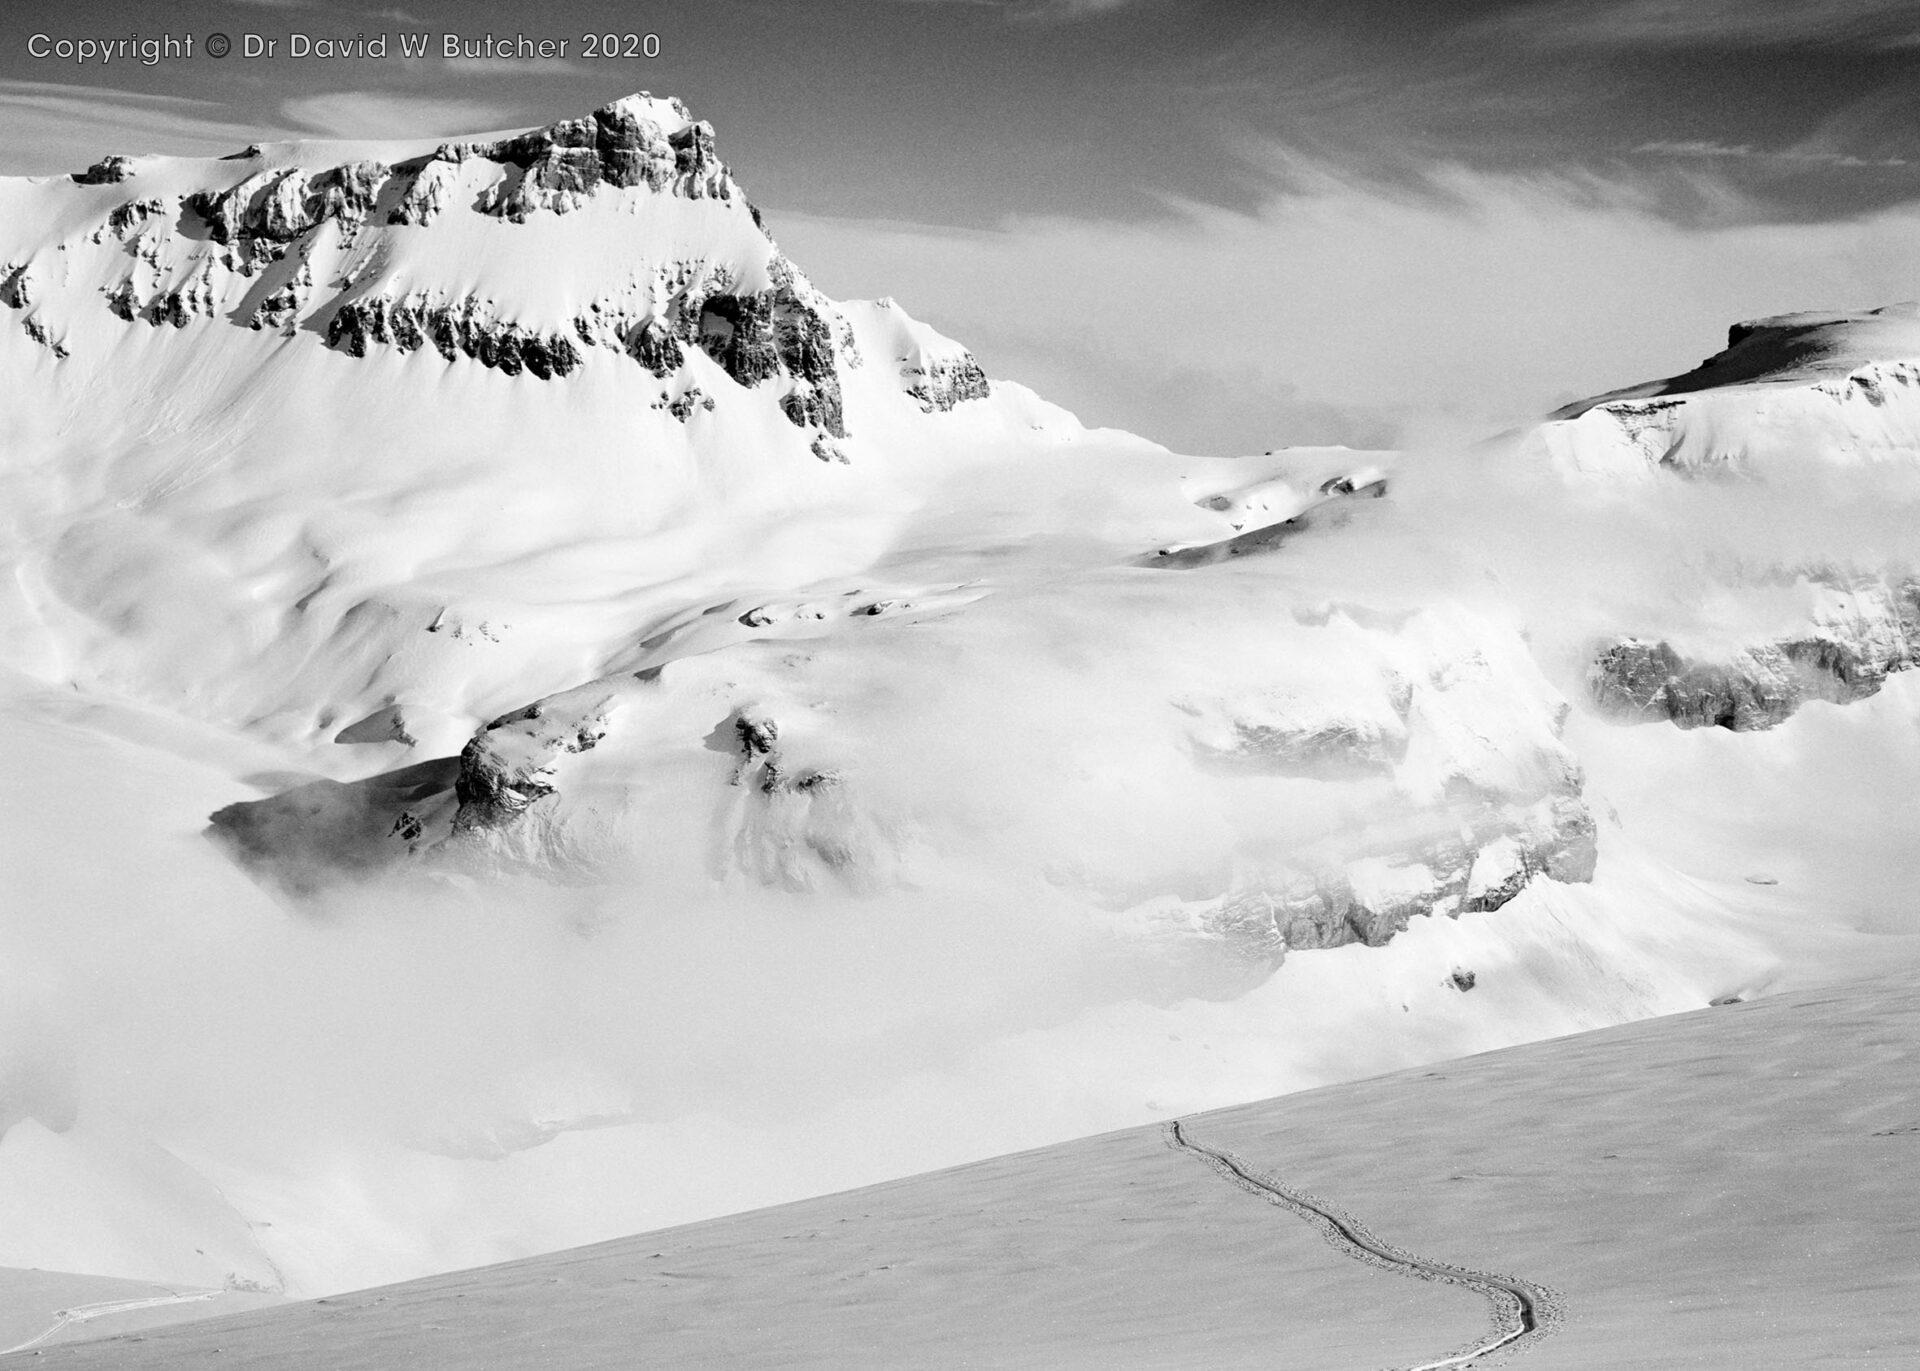 Crans Montana, Grossstrubel and Strubelegga from Schwarzhorn Ascent, Switzerland